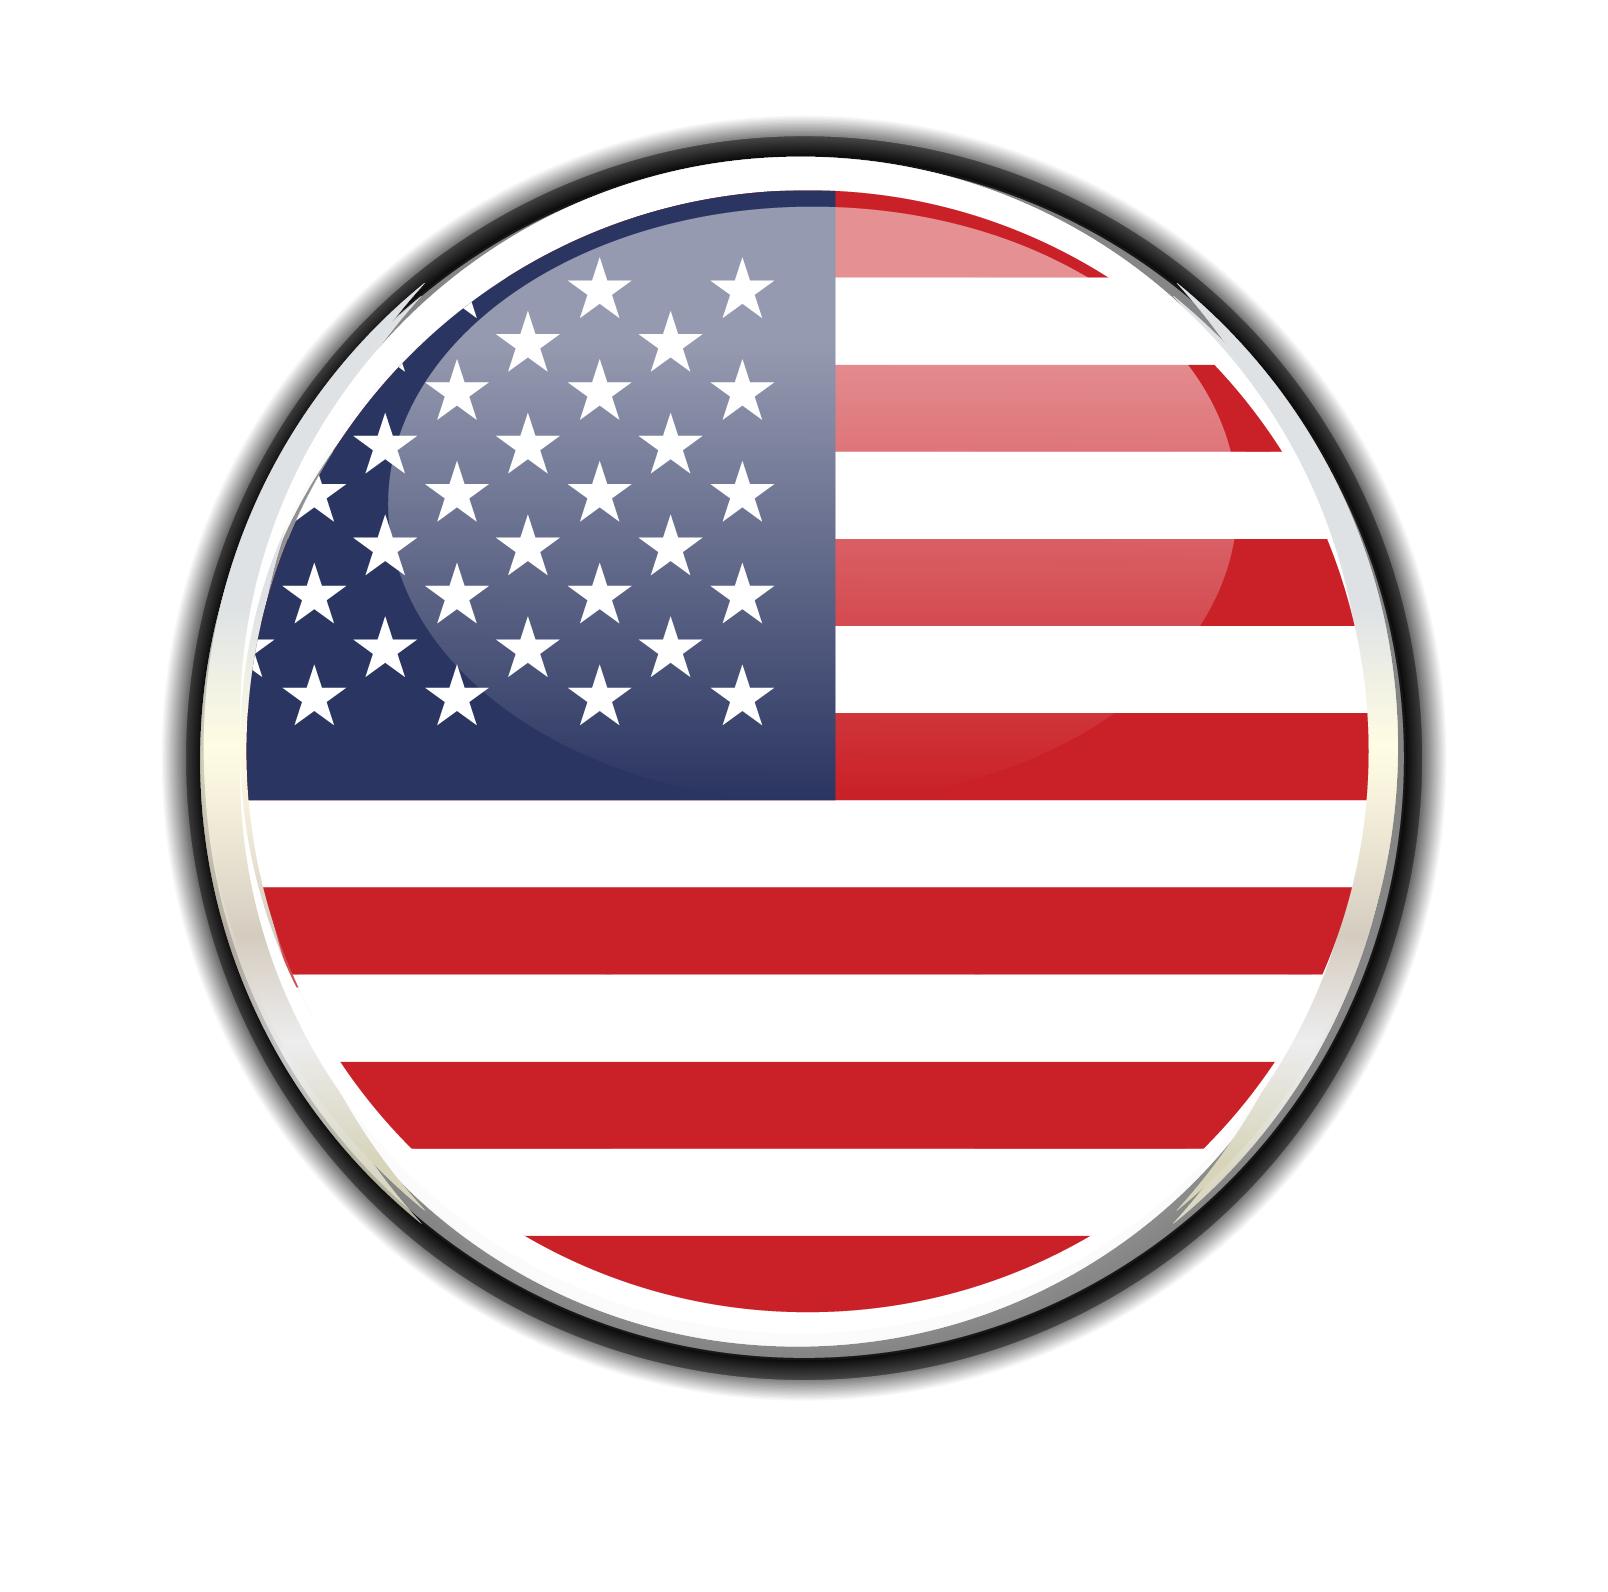 1608x1592 15 Bandera De Venezuela Y Usa Png For Free Download On Mbtskoudsalg